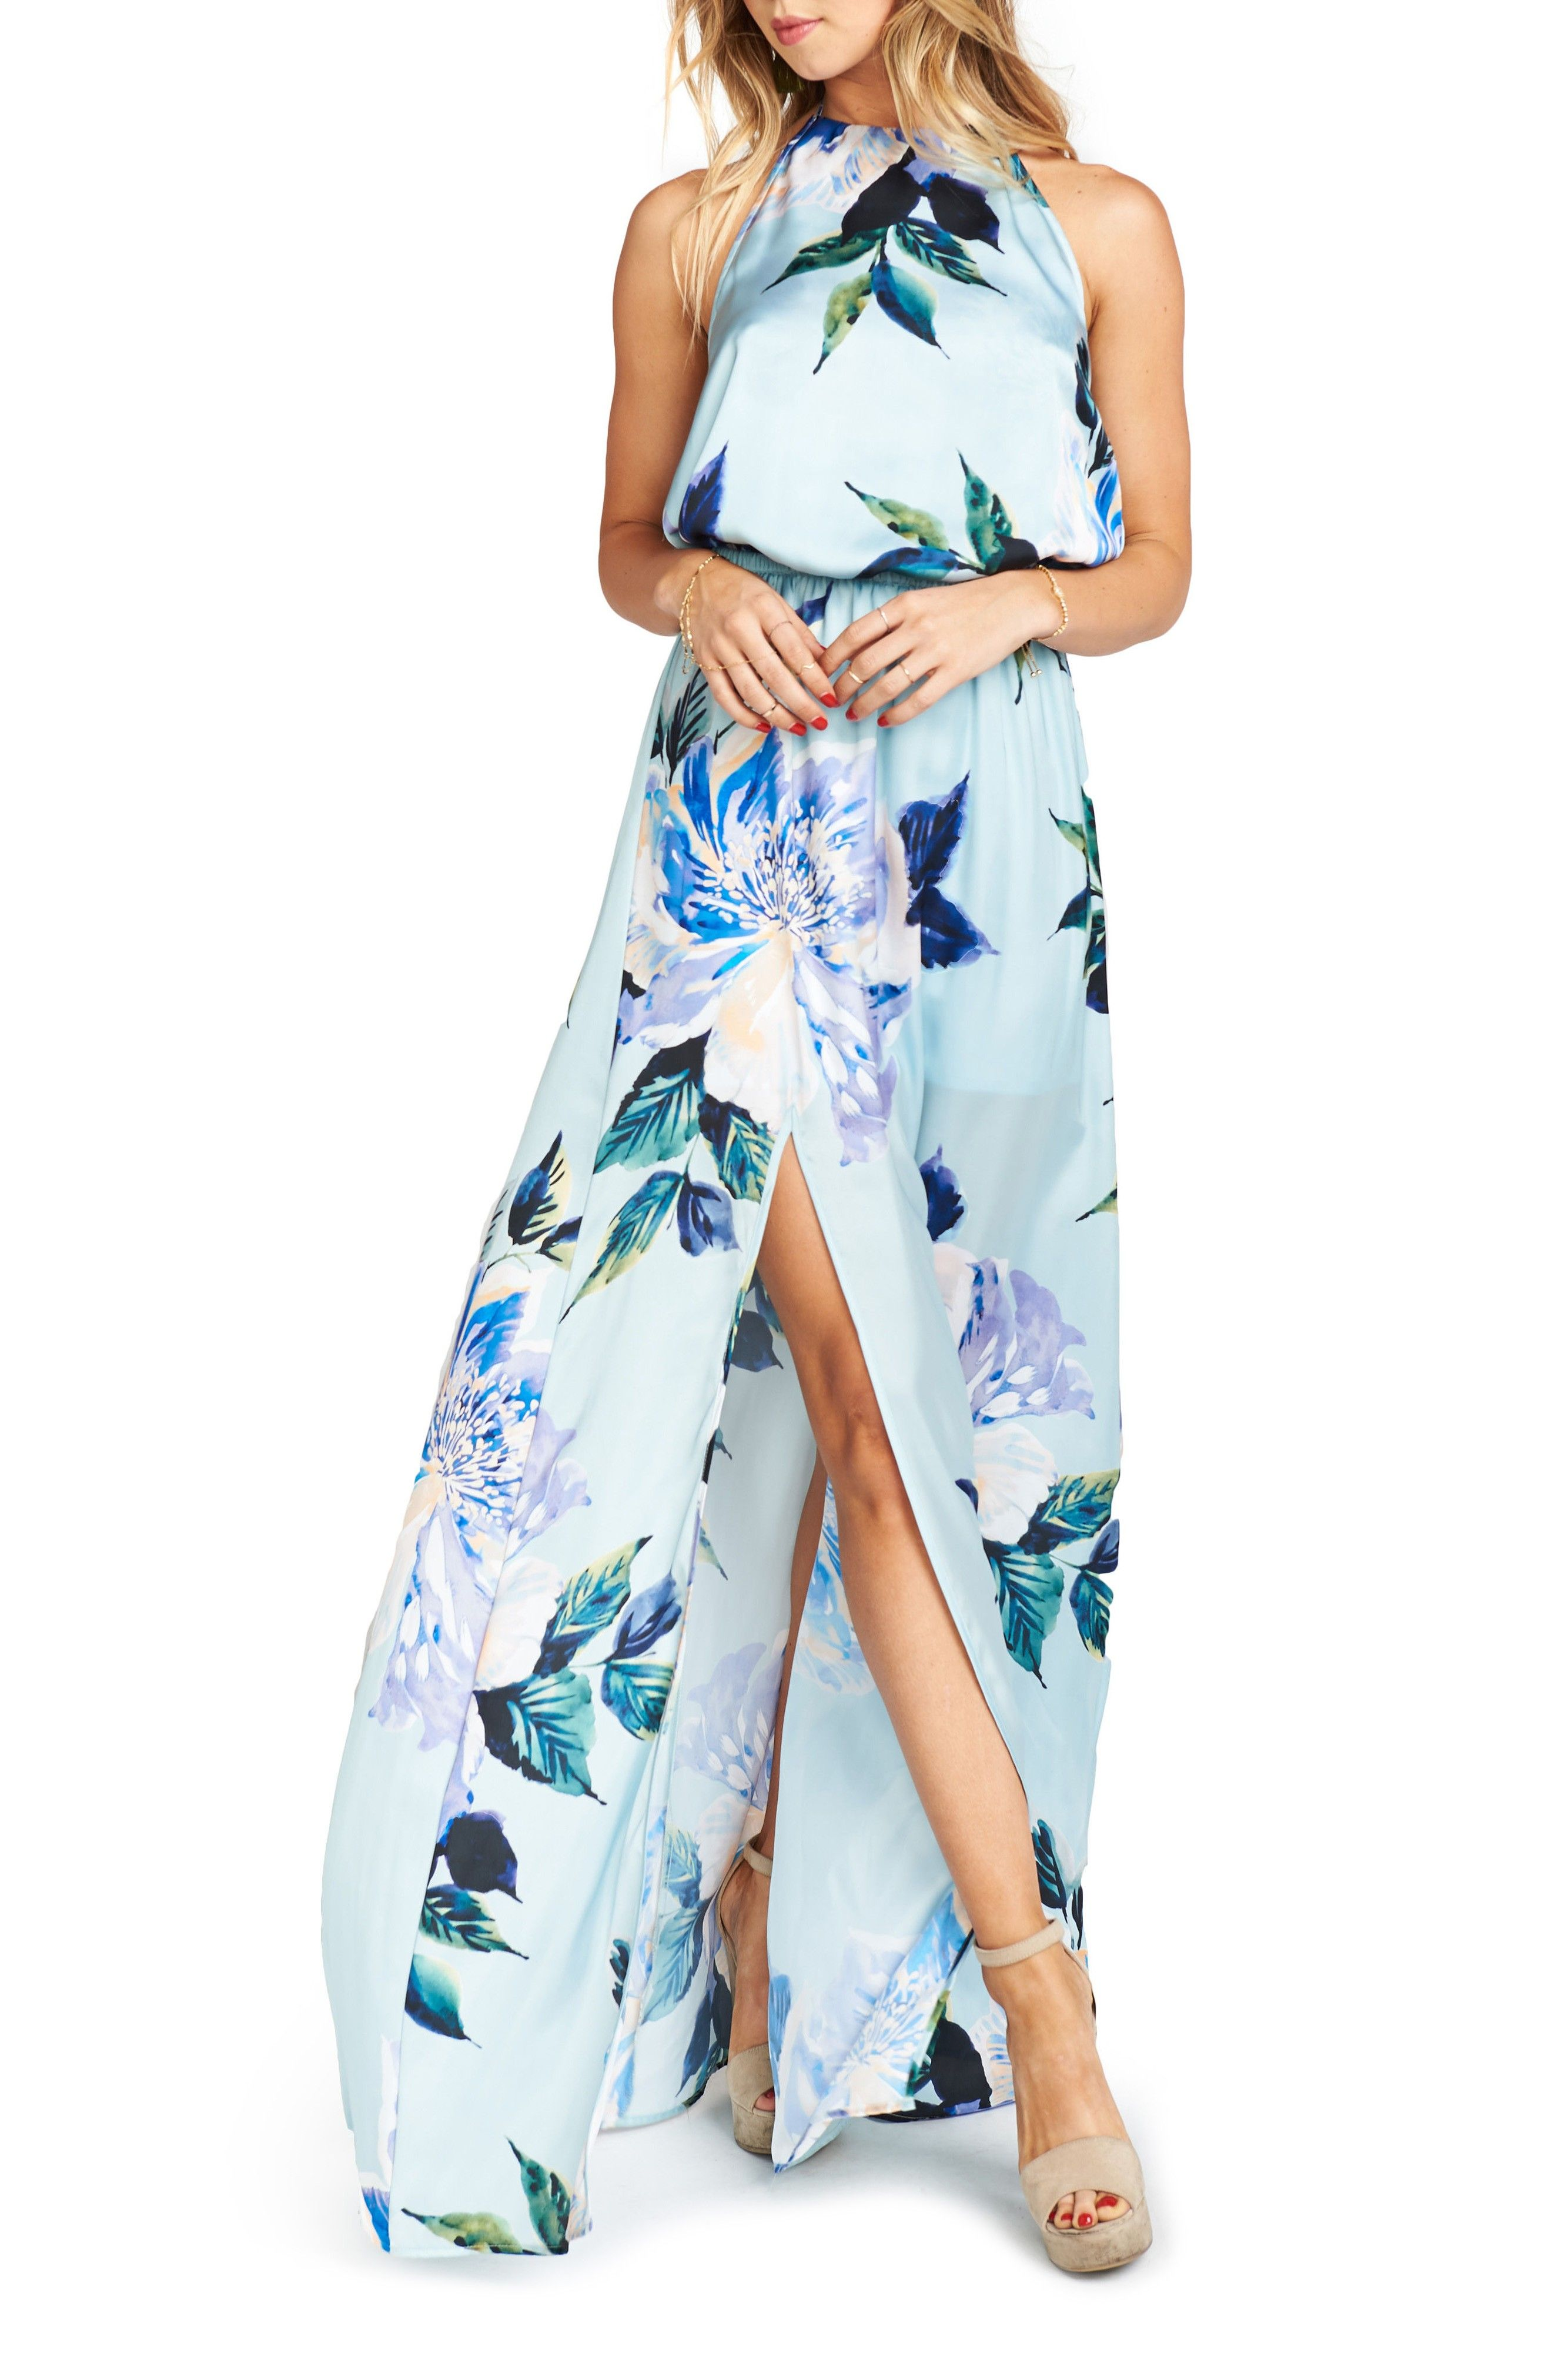 Summer wedding floral dresses weddinggueststyle pinterest